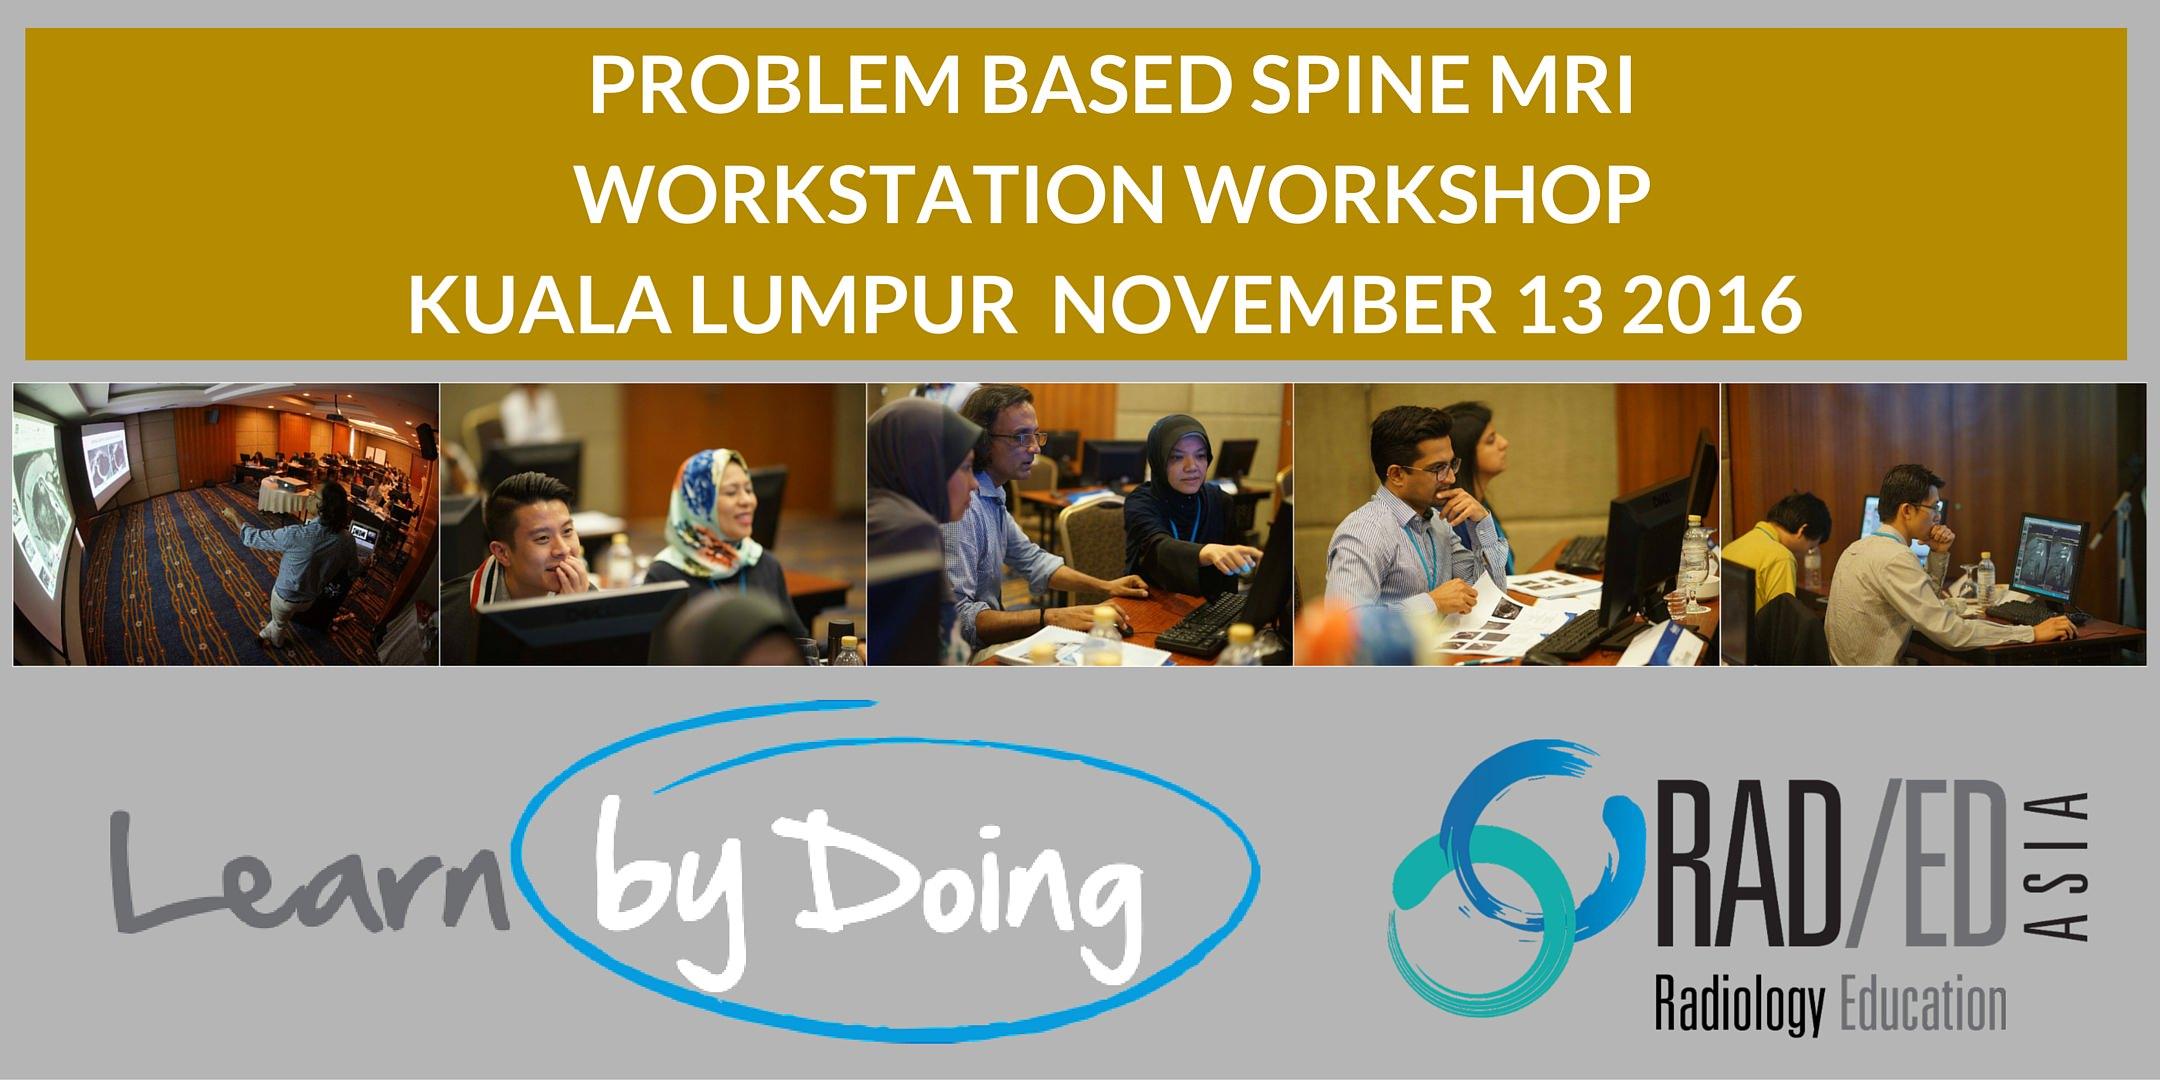 spine mri conference radiology